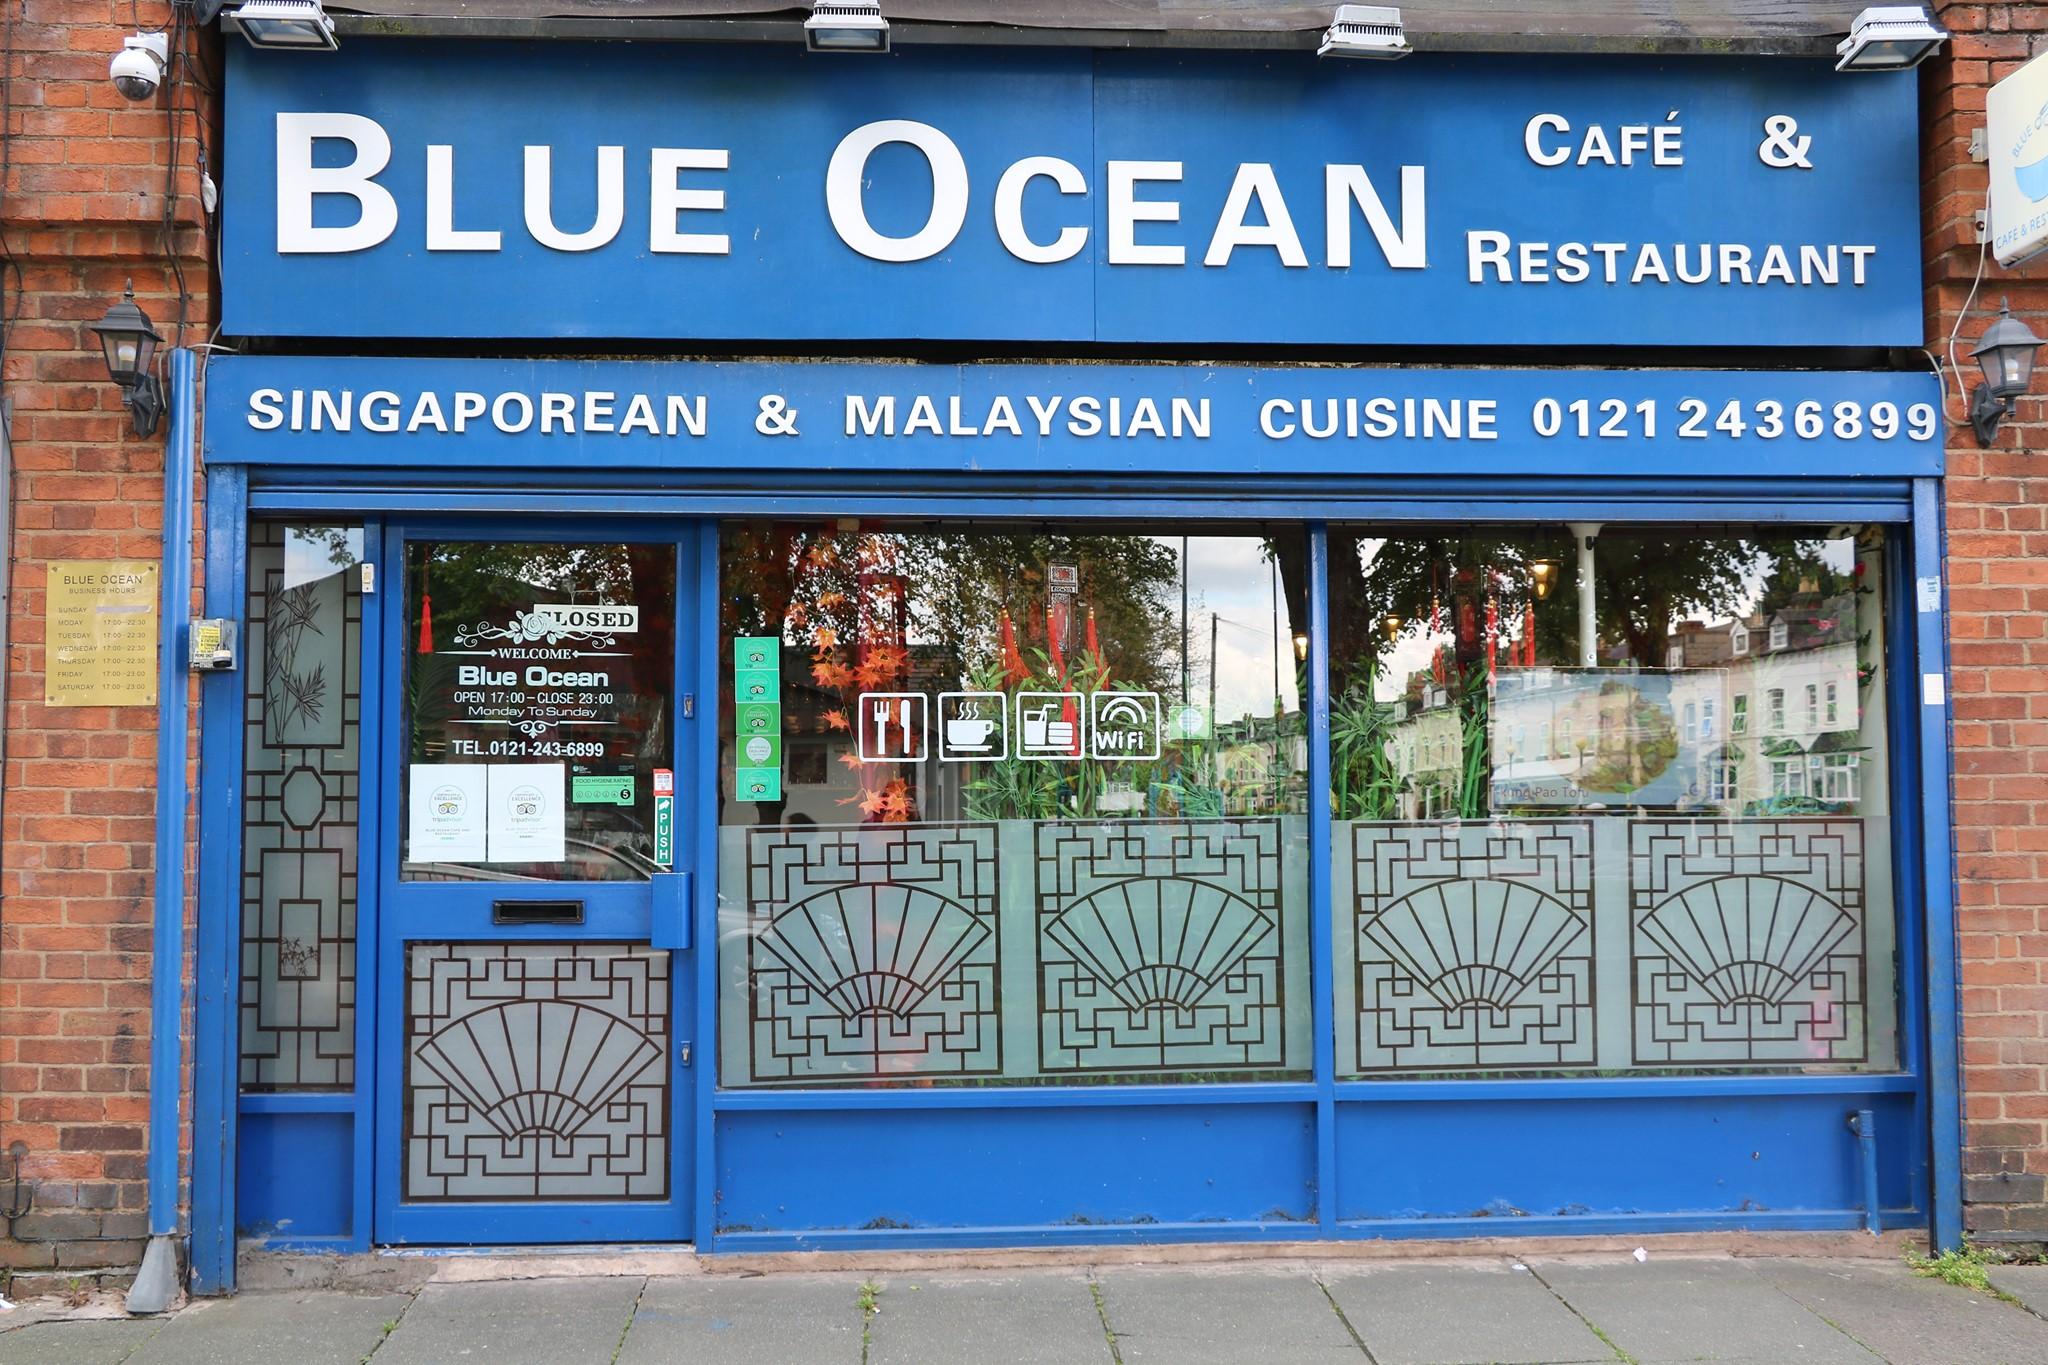 Blue Ocean Cafe & Restaurant